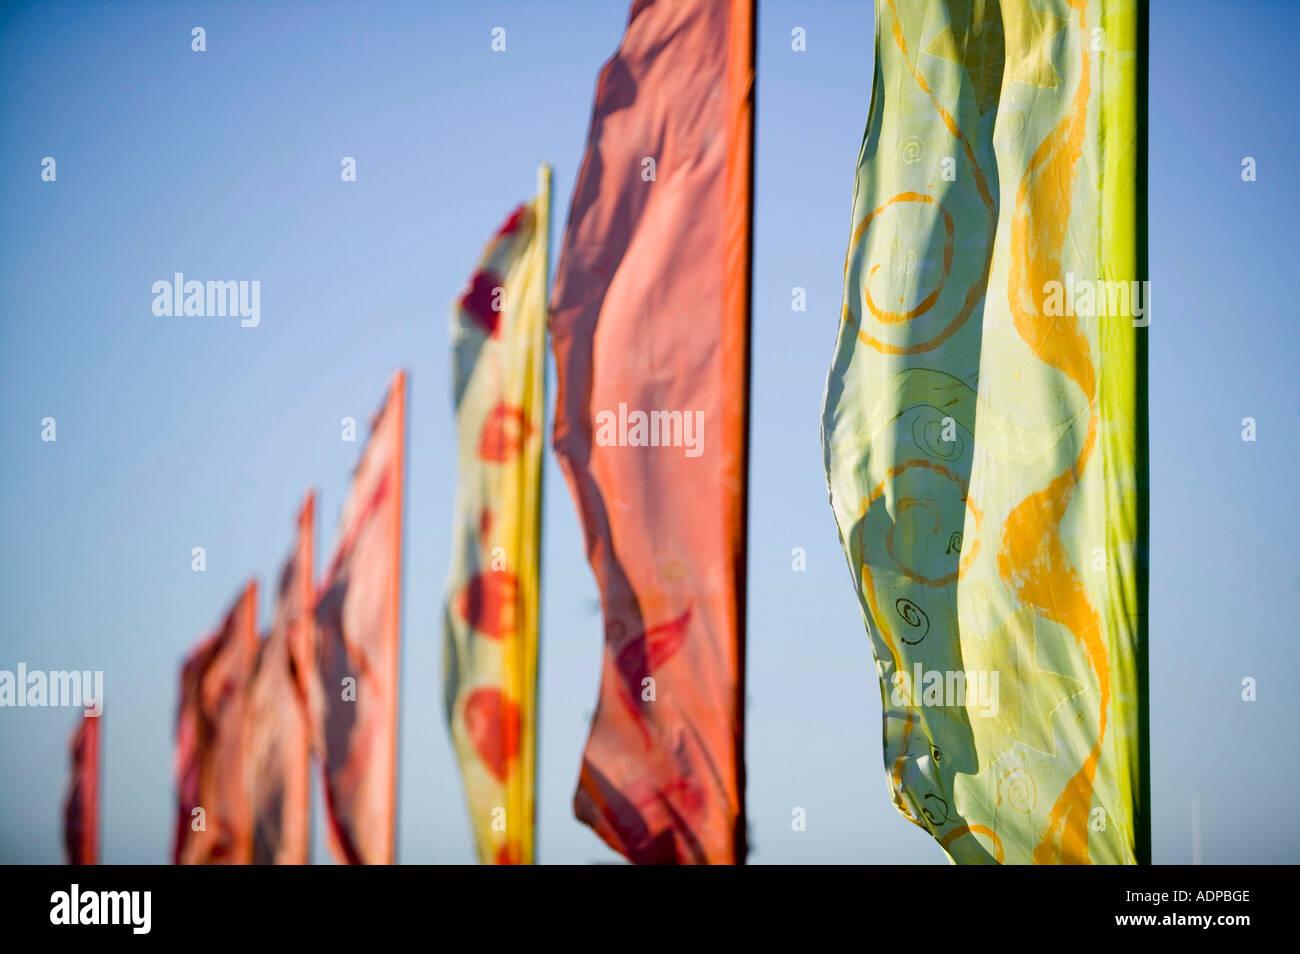 Fahnen an der Appledore Festival, North Devon, UK Stockbild